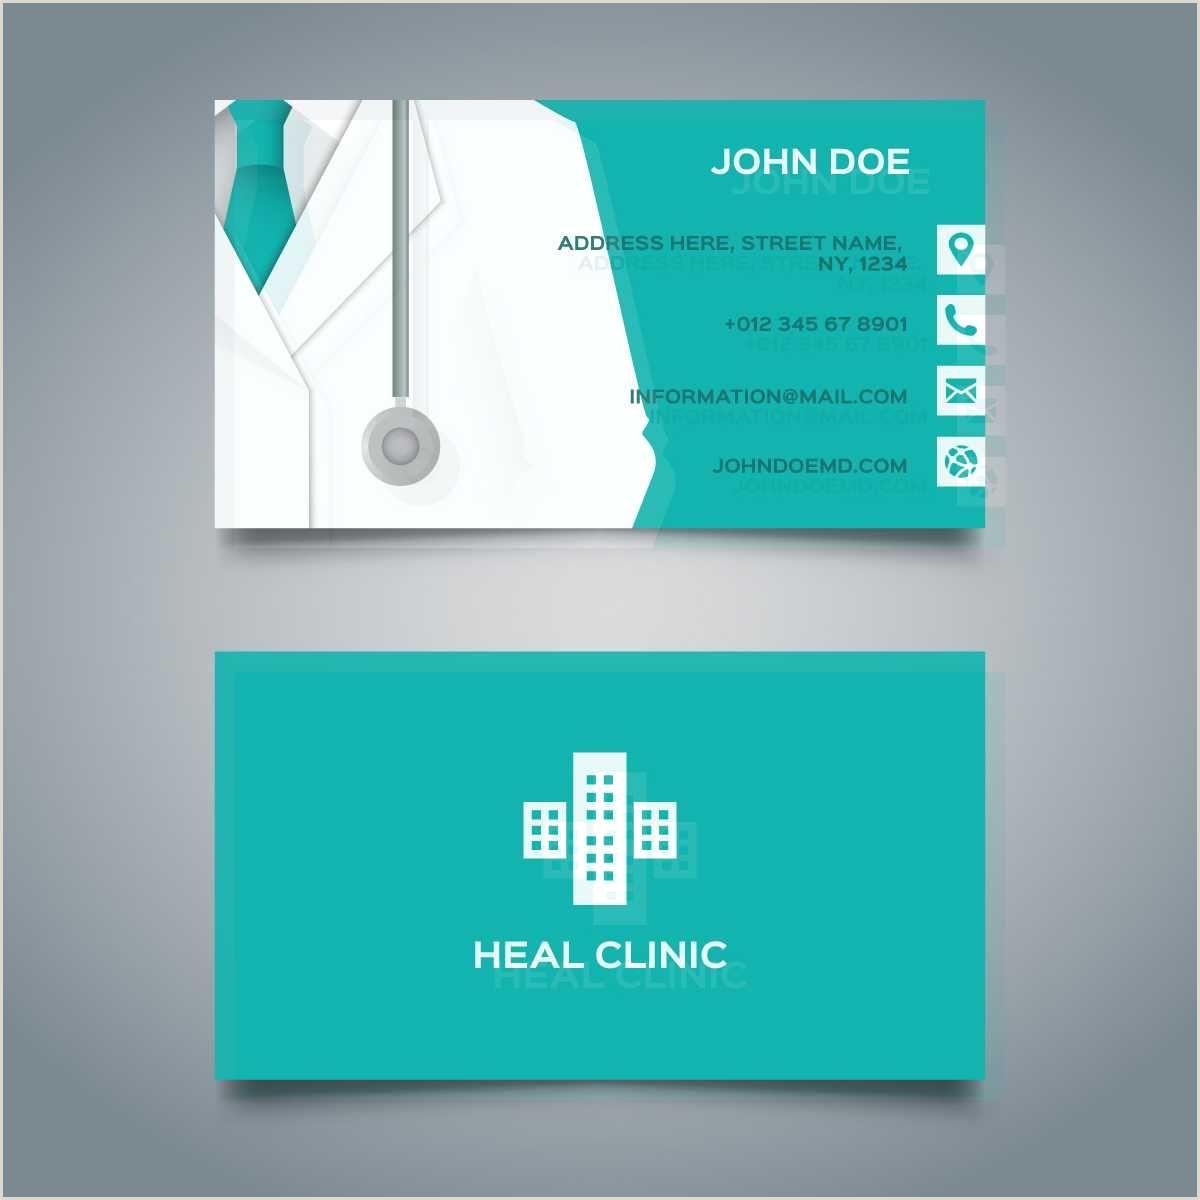 Bussiness Card Design Blue Medical Card Free